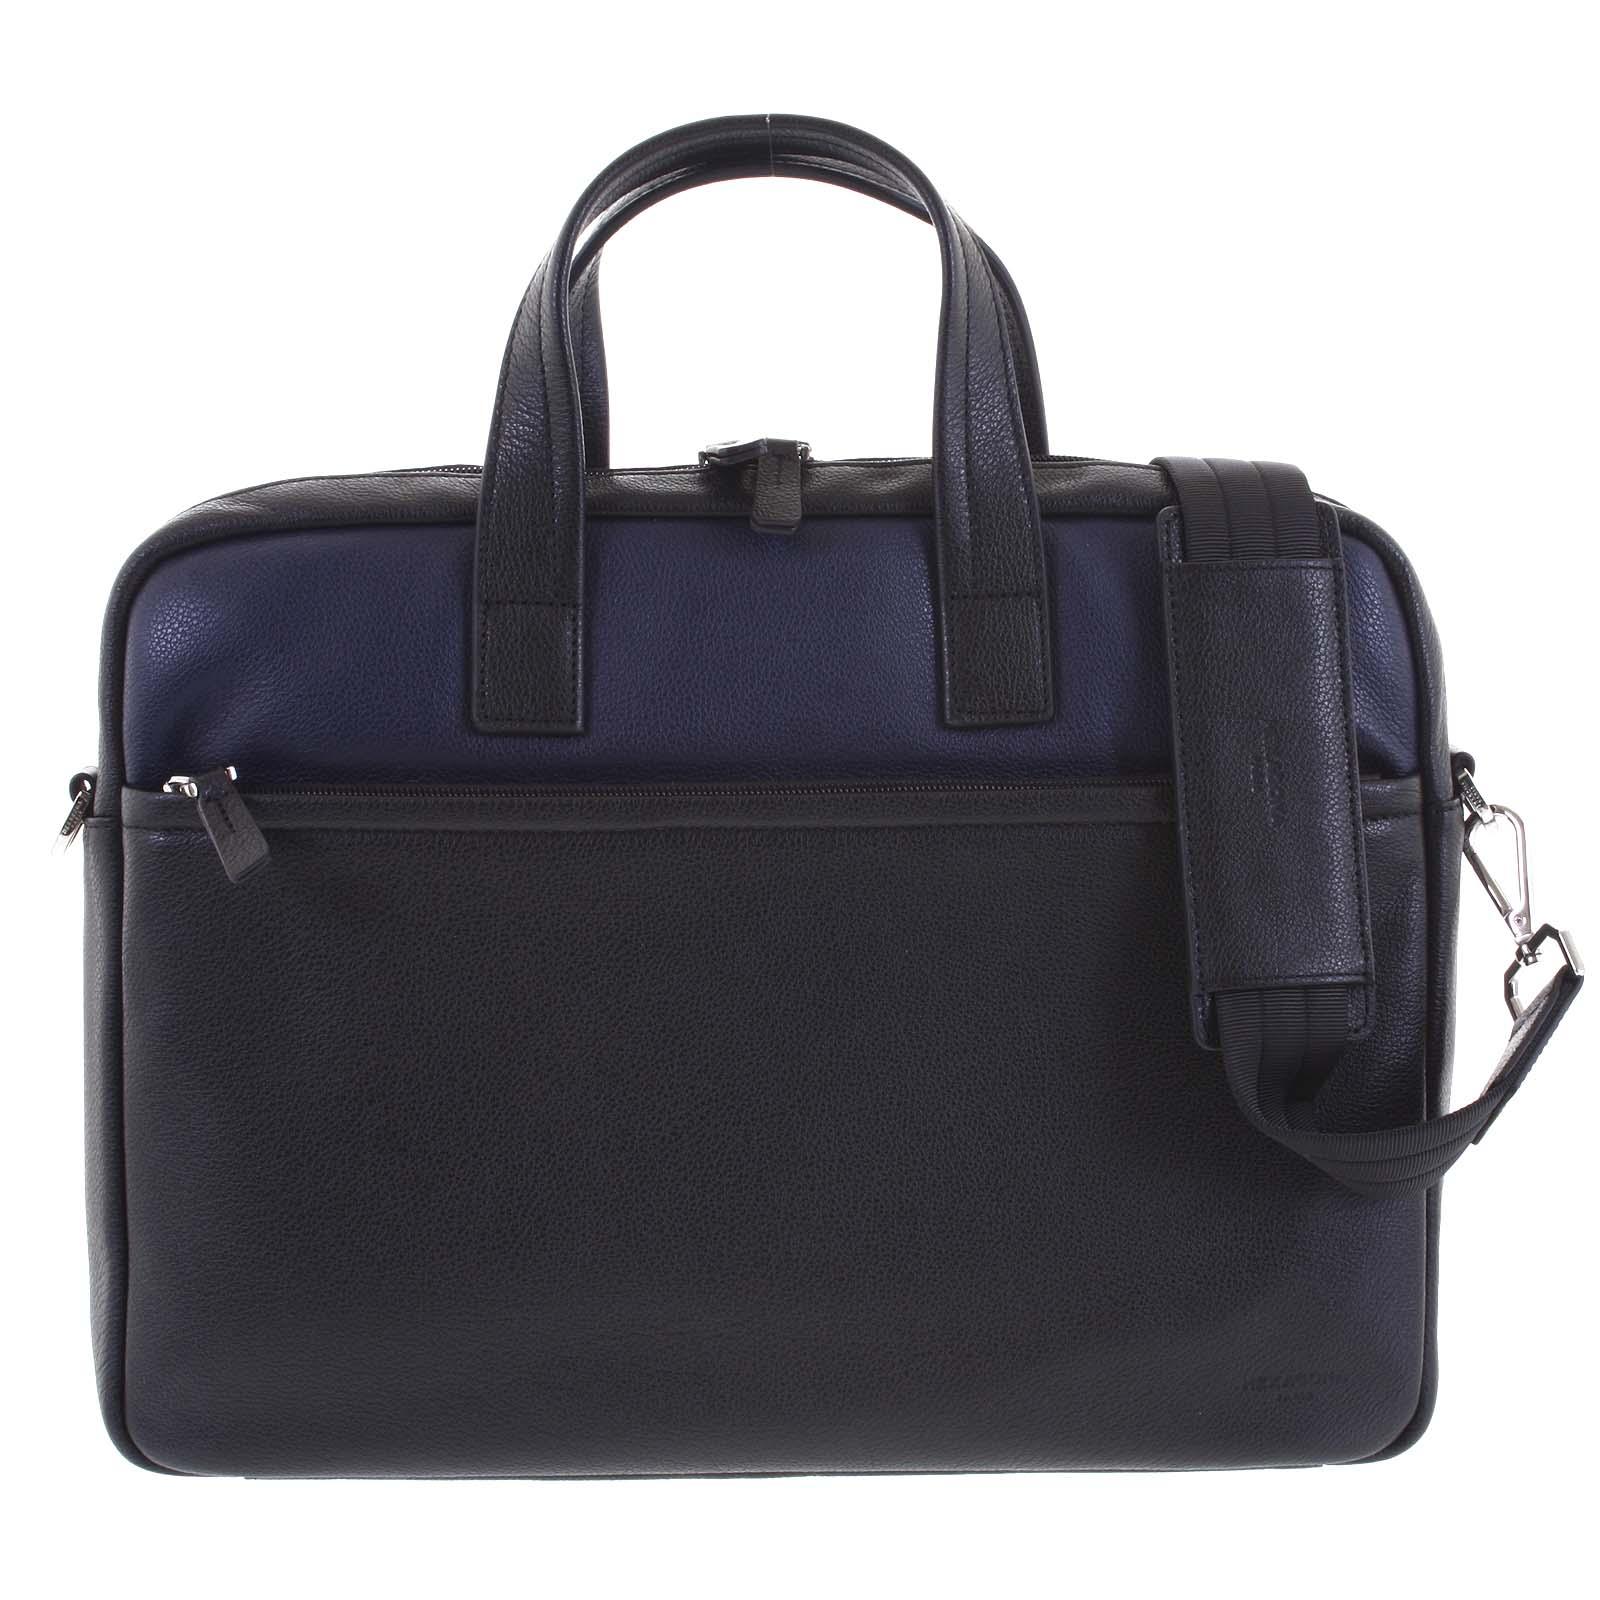 Luxusní pásnká kožená taška černo modrá - Hexagona Friday modrá